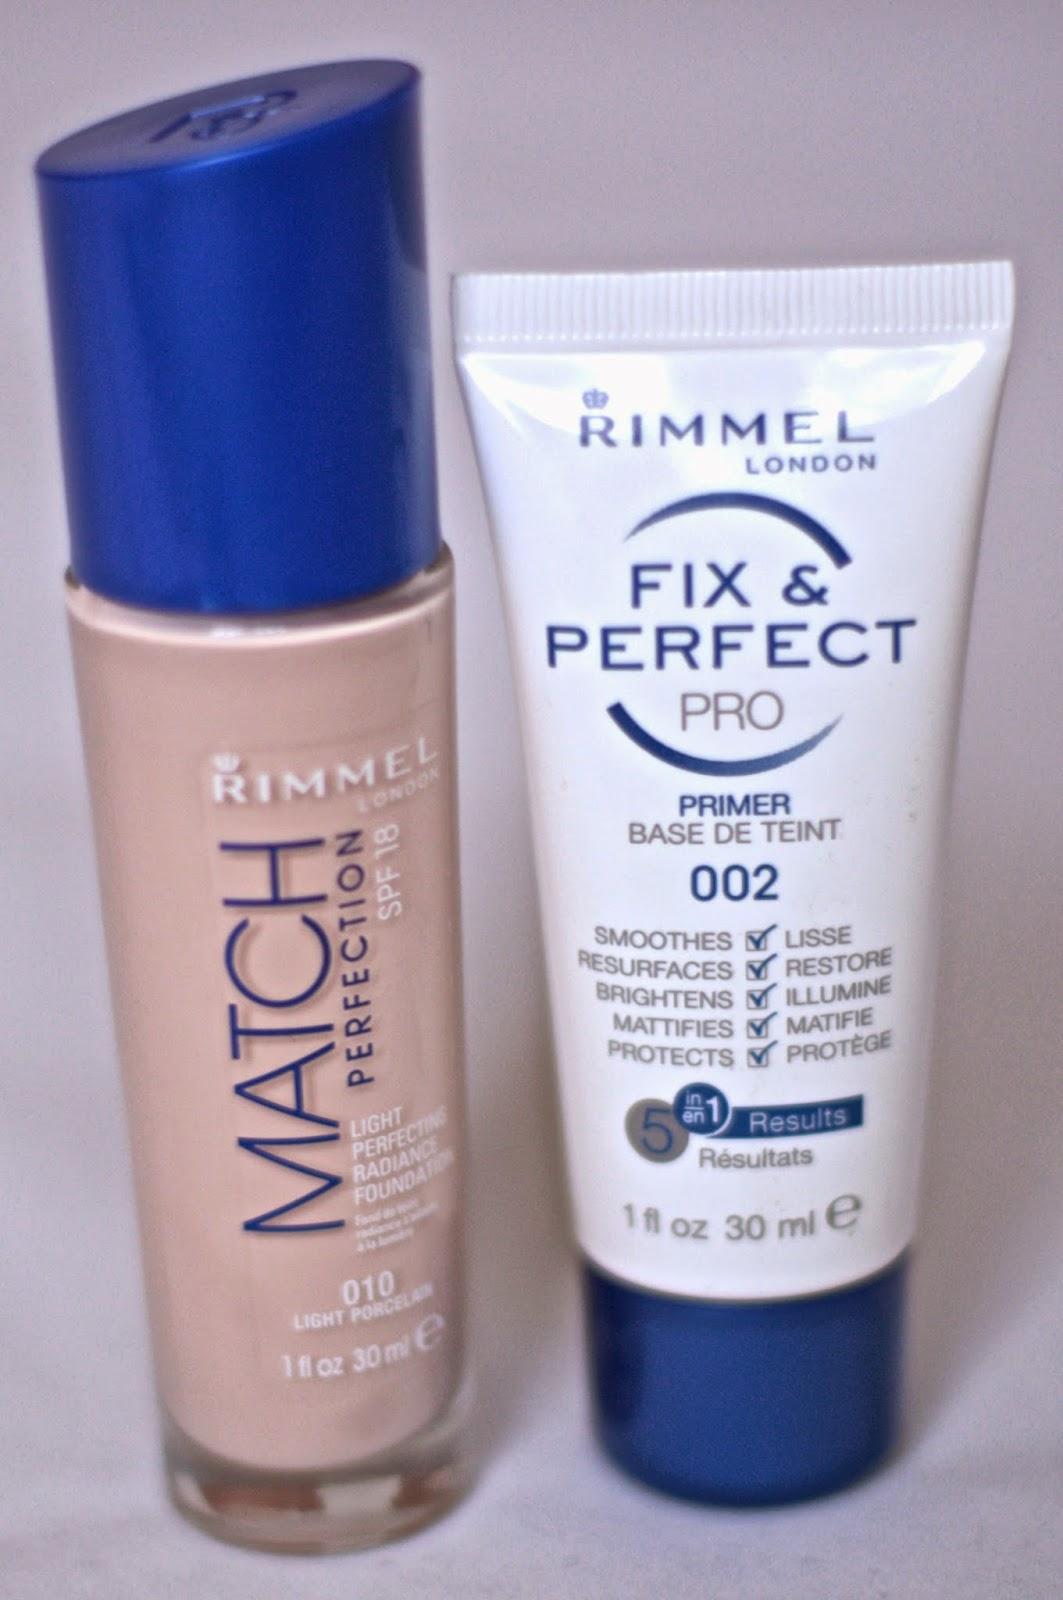 Rimmel Match Perfection foundation & Fix Perfect Pro Primer 002